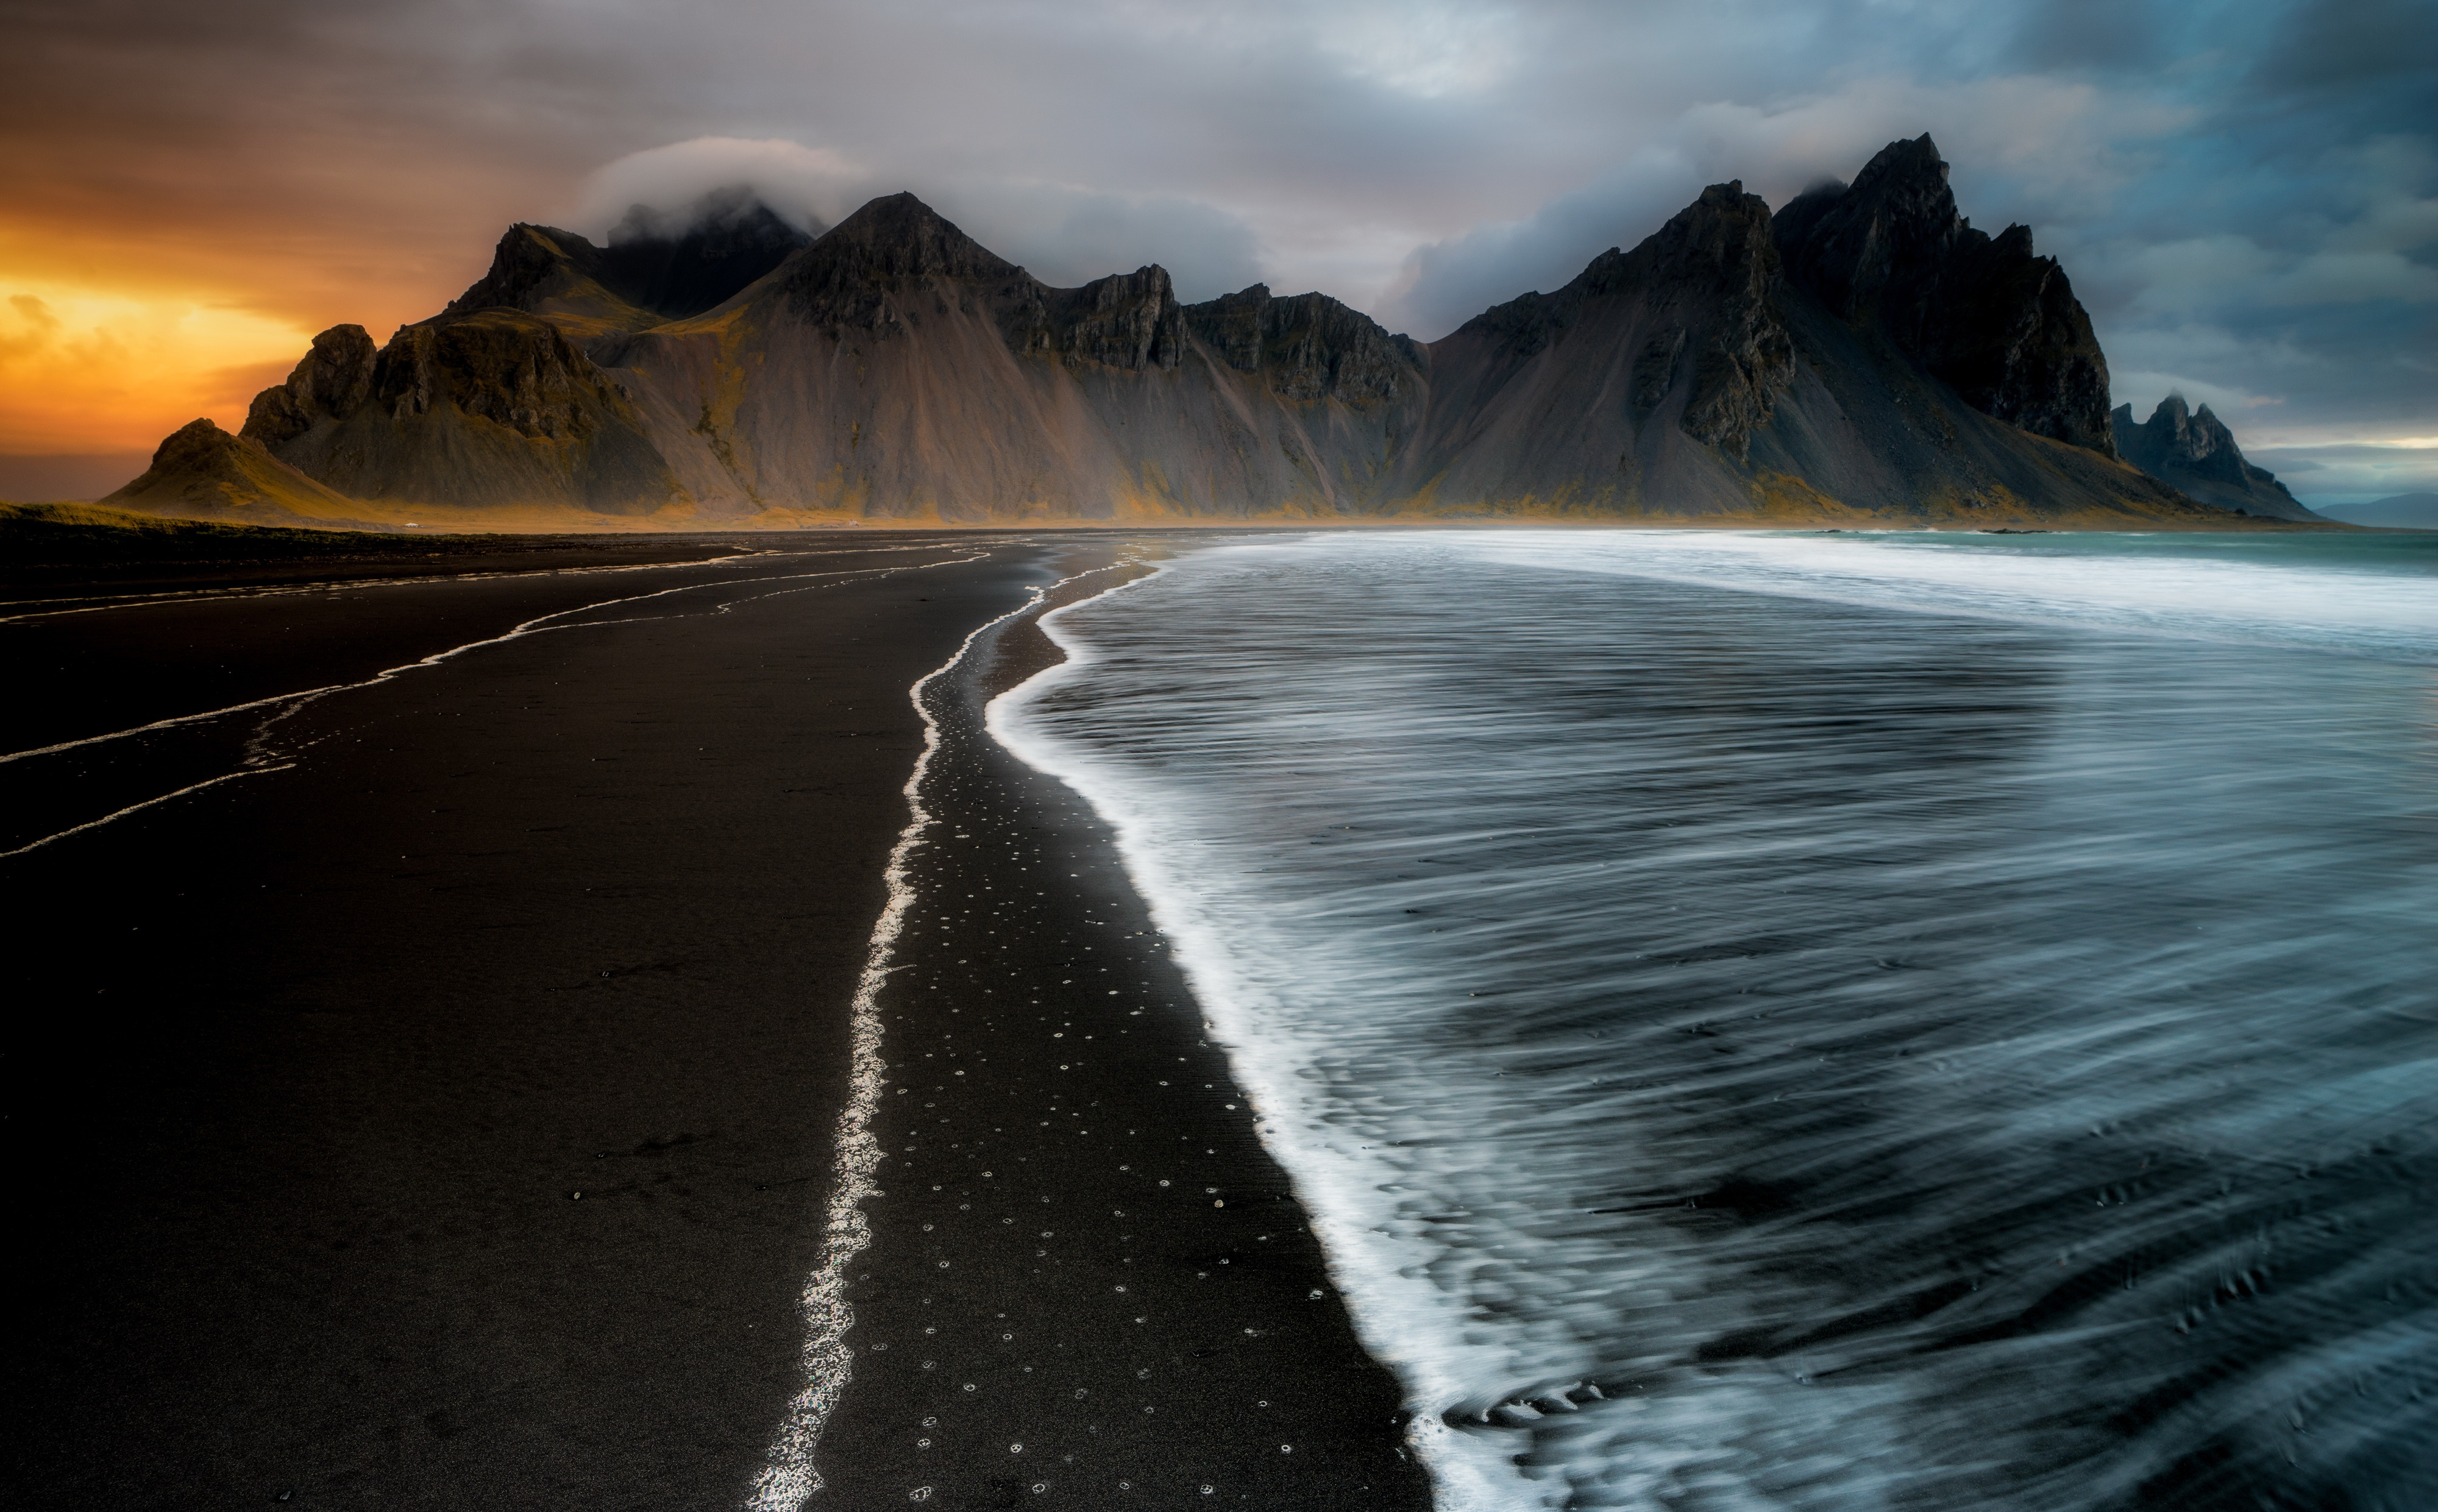 Iphone 6s Plus 4k Wallpaper: 1080x1920 Water Iceland Coast 4k Iphone 7,6s,6 Plus, Pixel